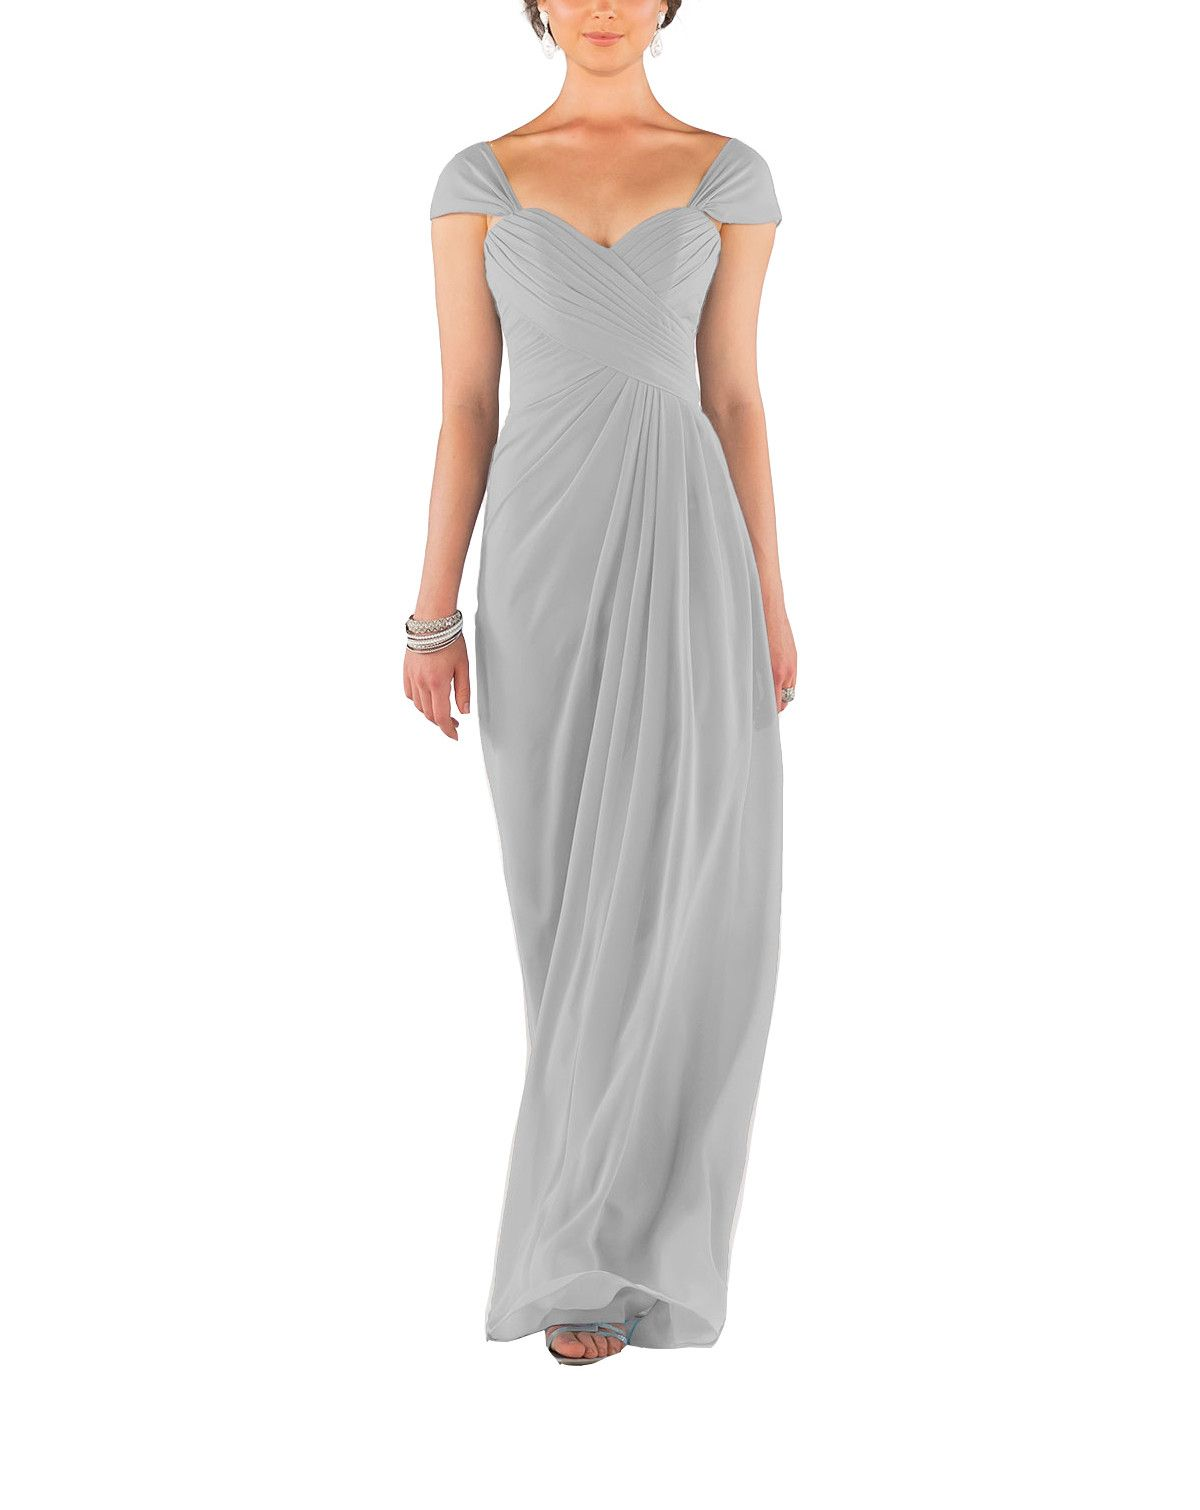 Sorella vita style current fashion trends dress collection